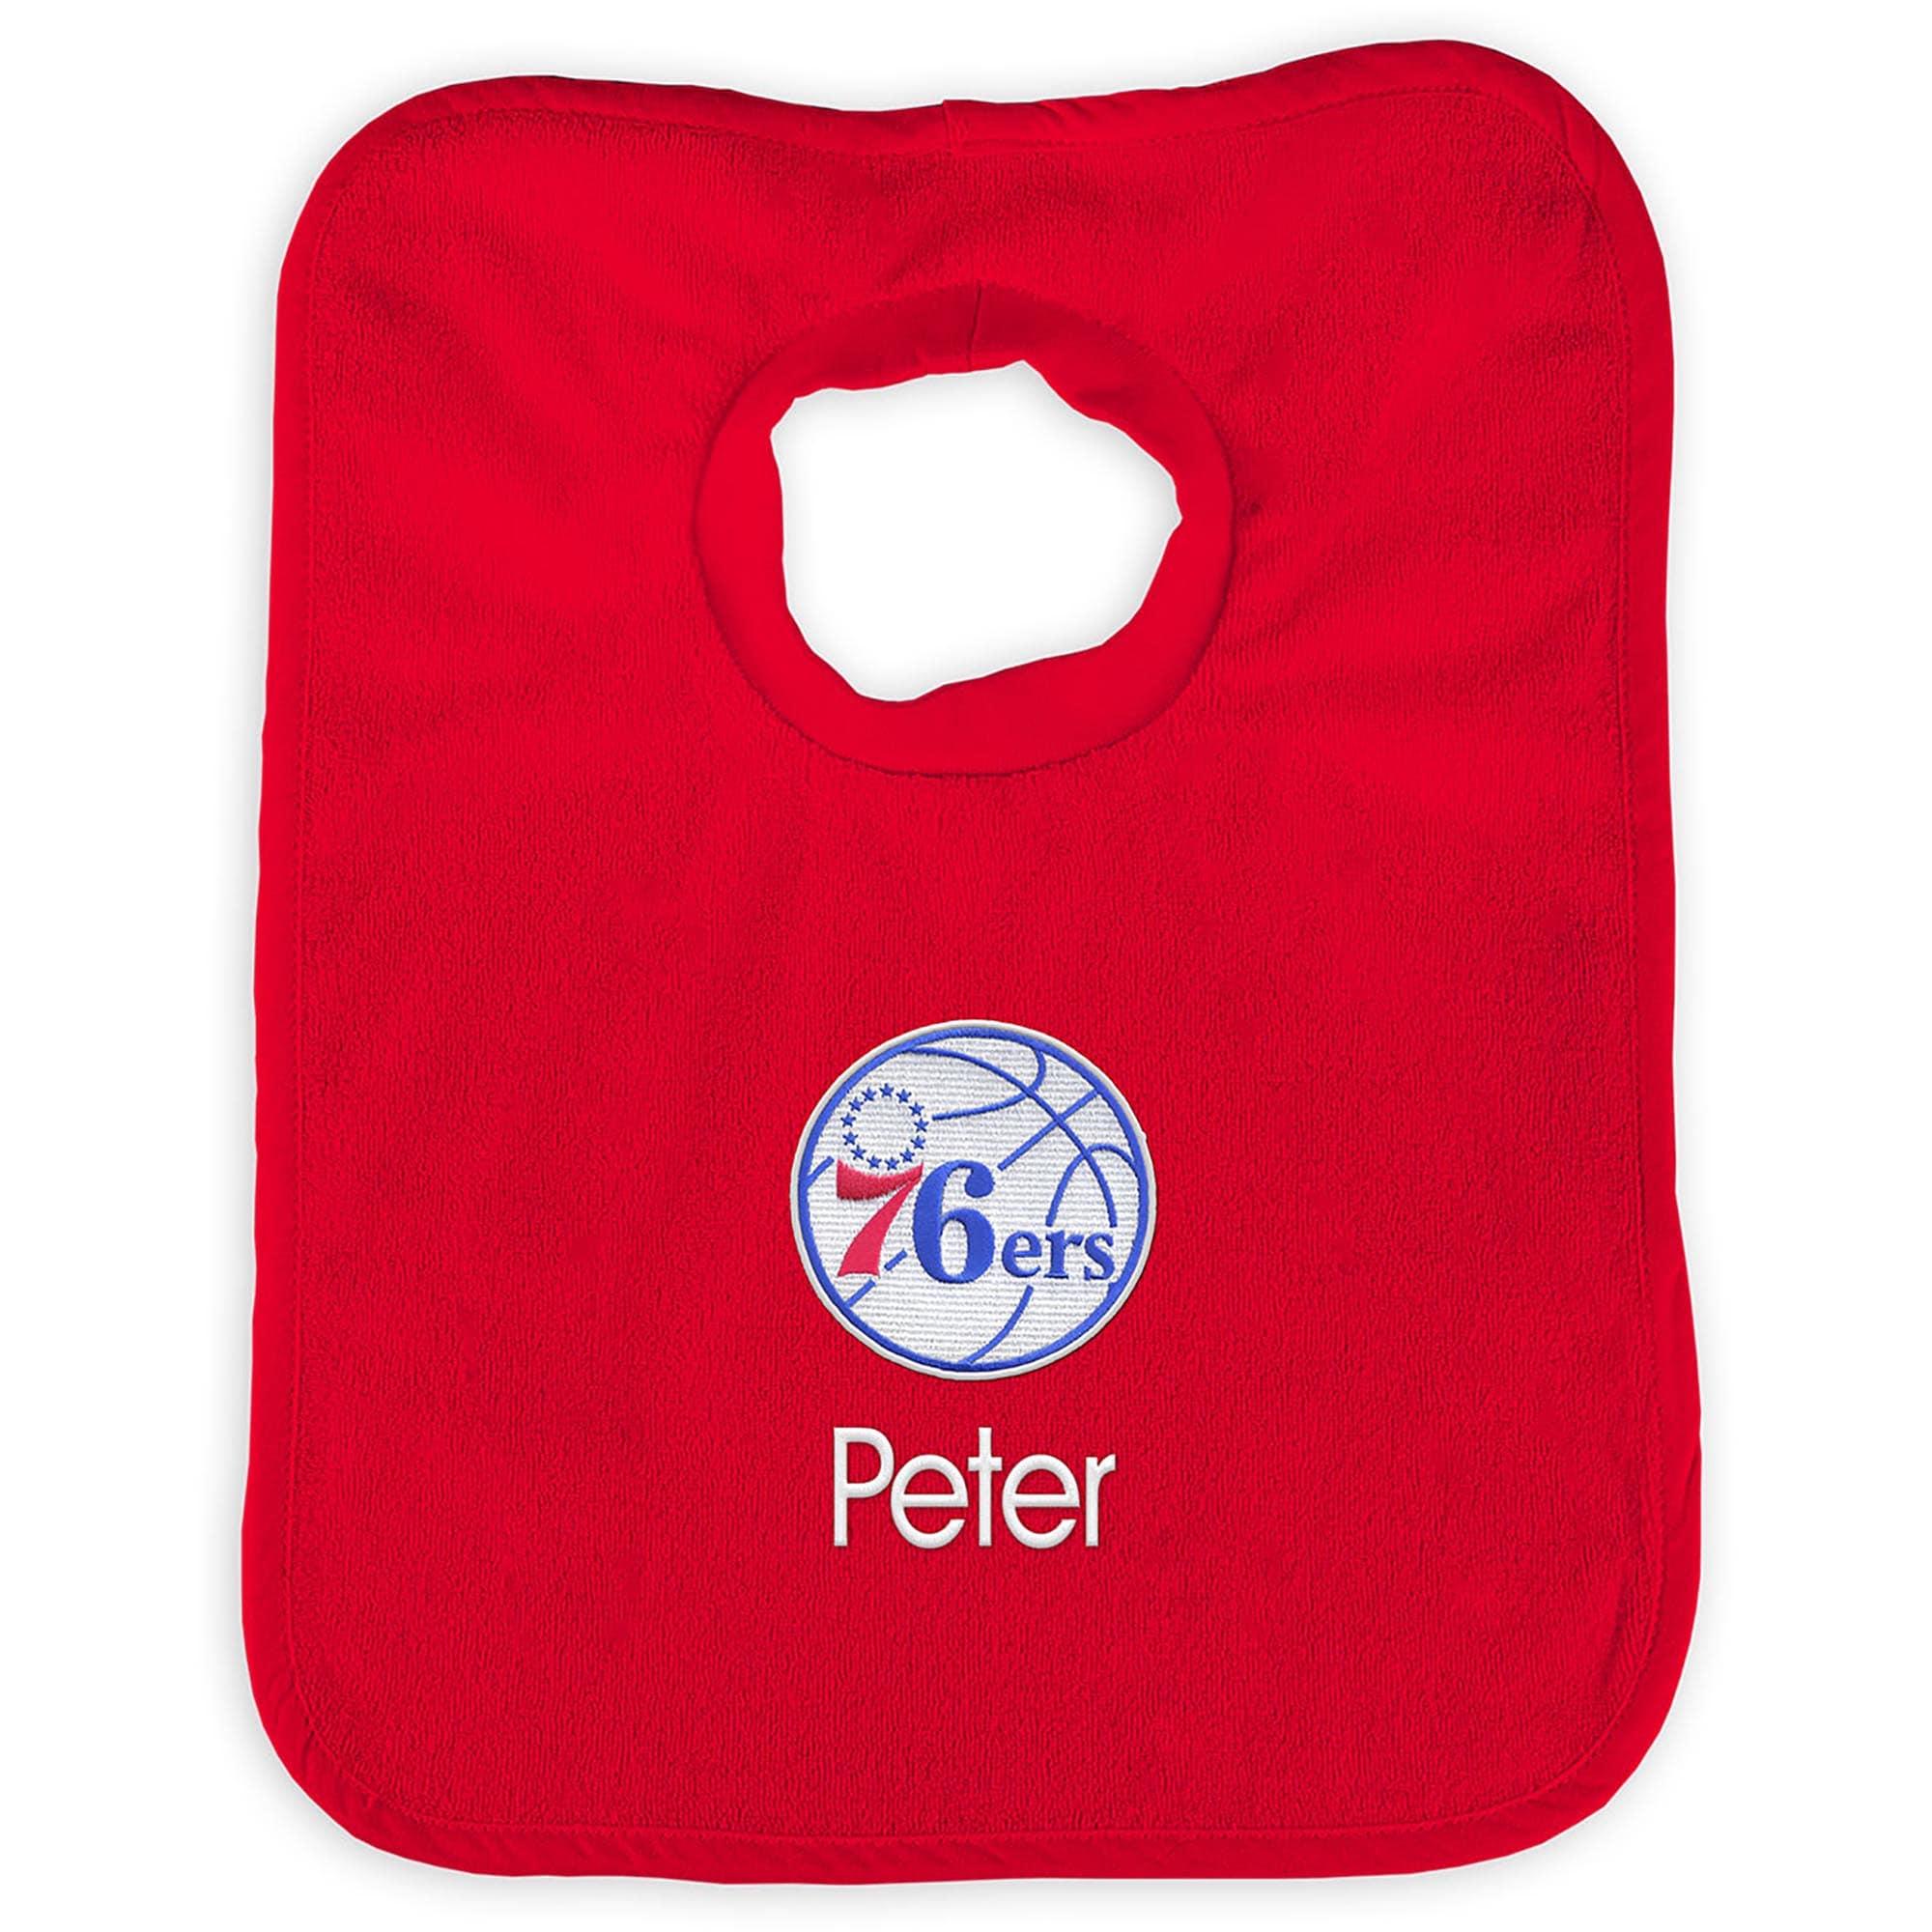 Philadelphia 76ers Infant Personalized Bib - Red